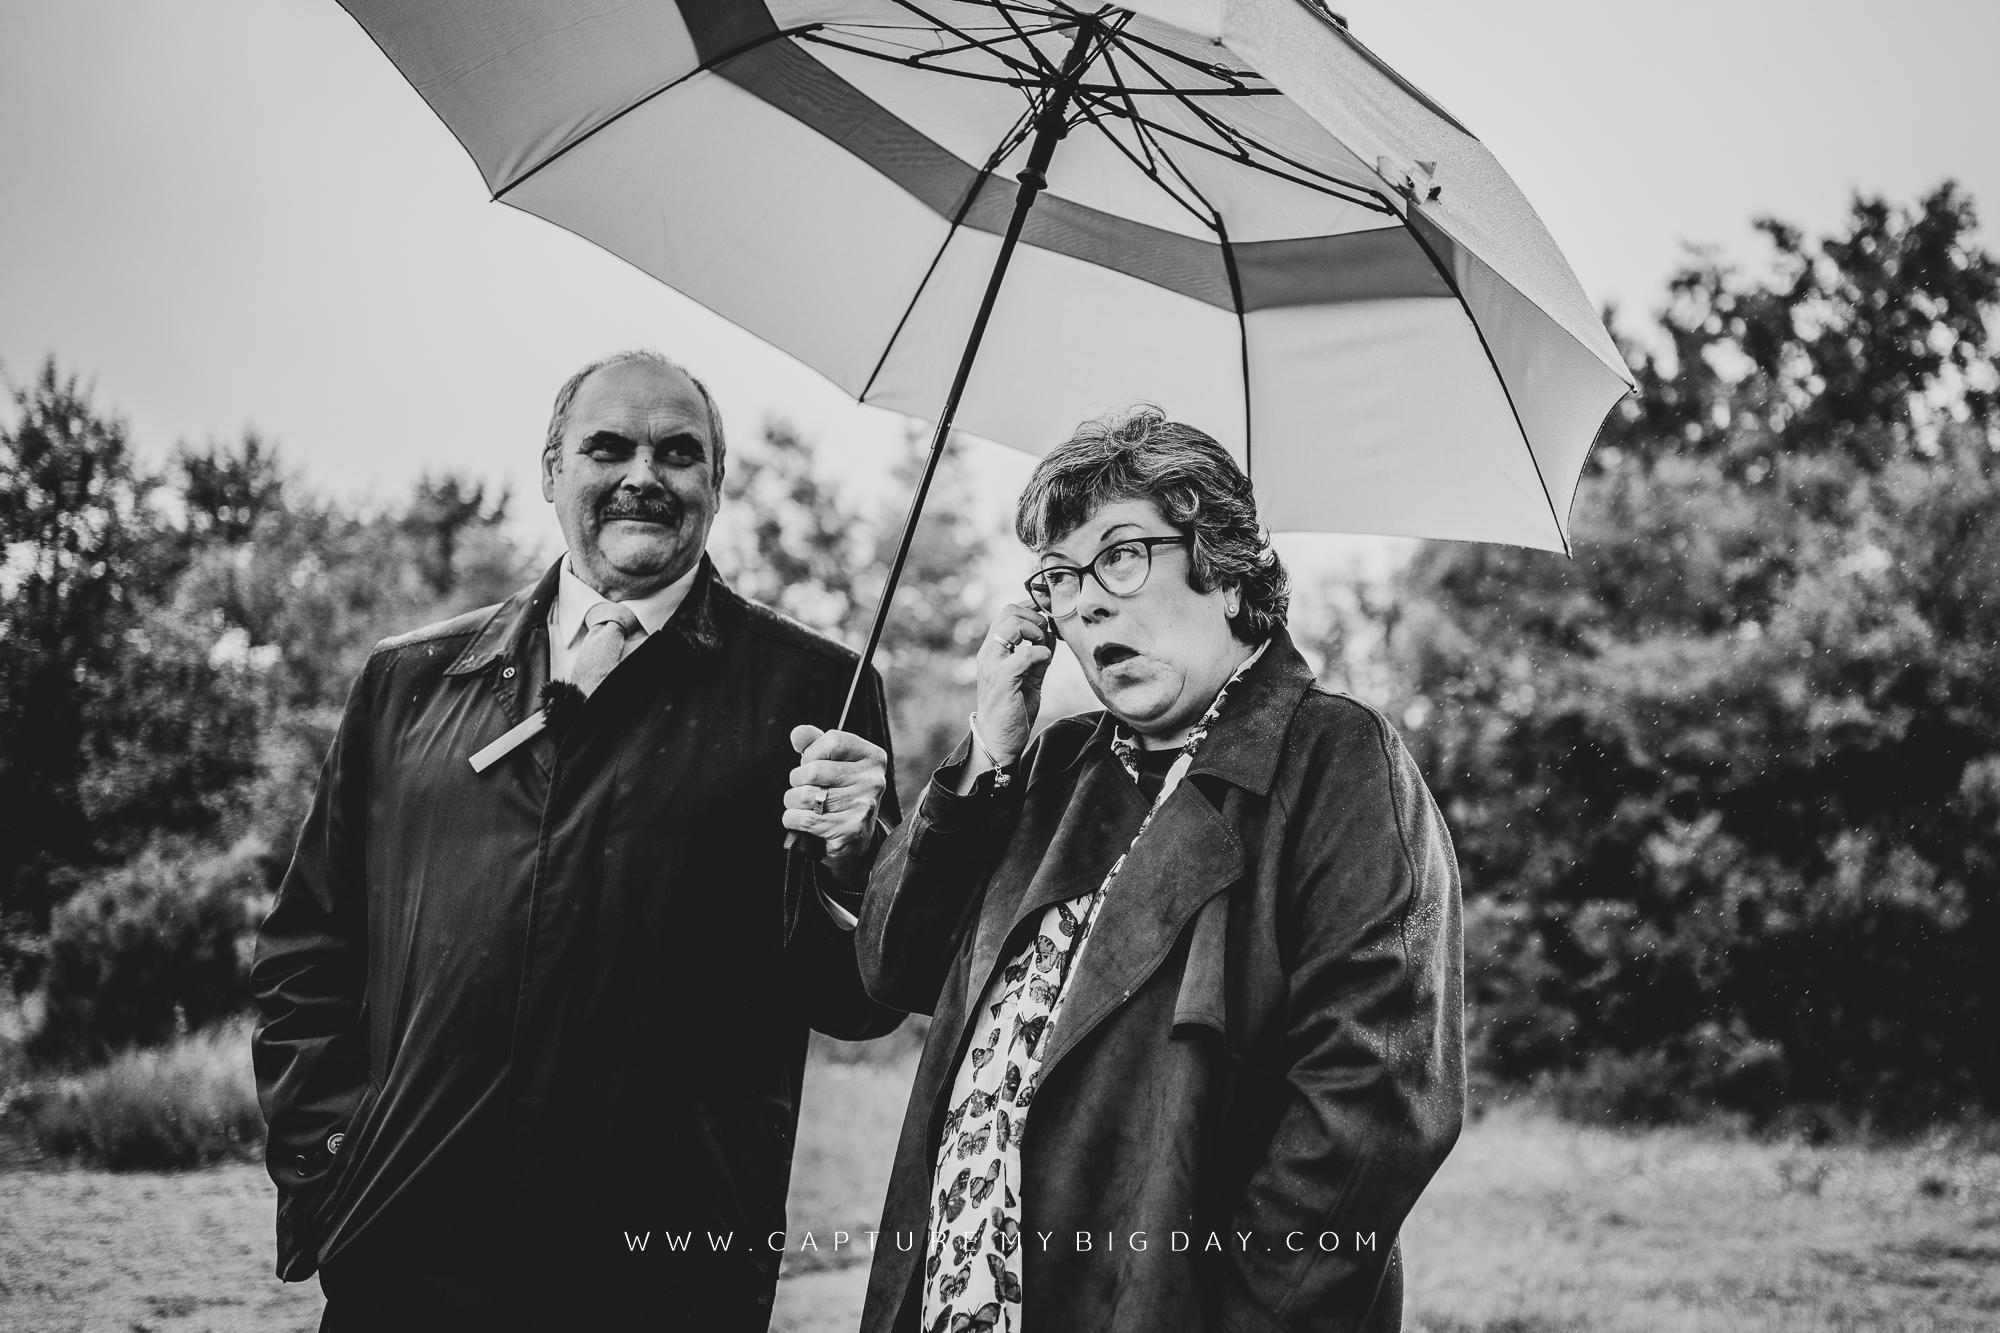 Parents crying under umbrella